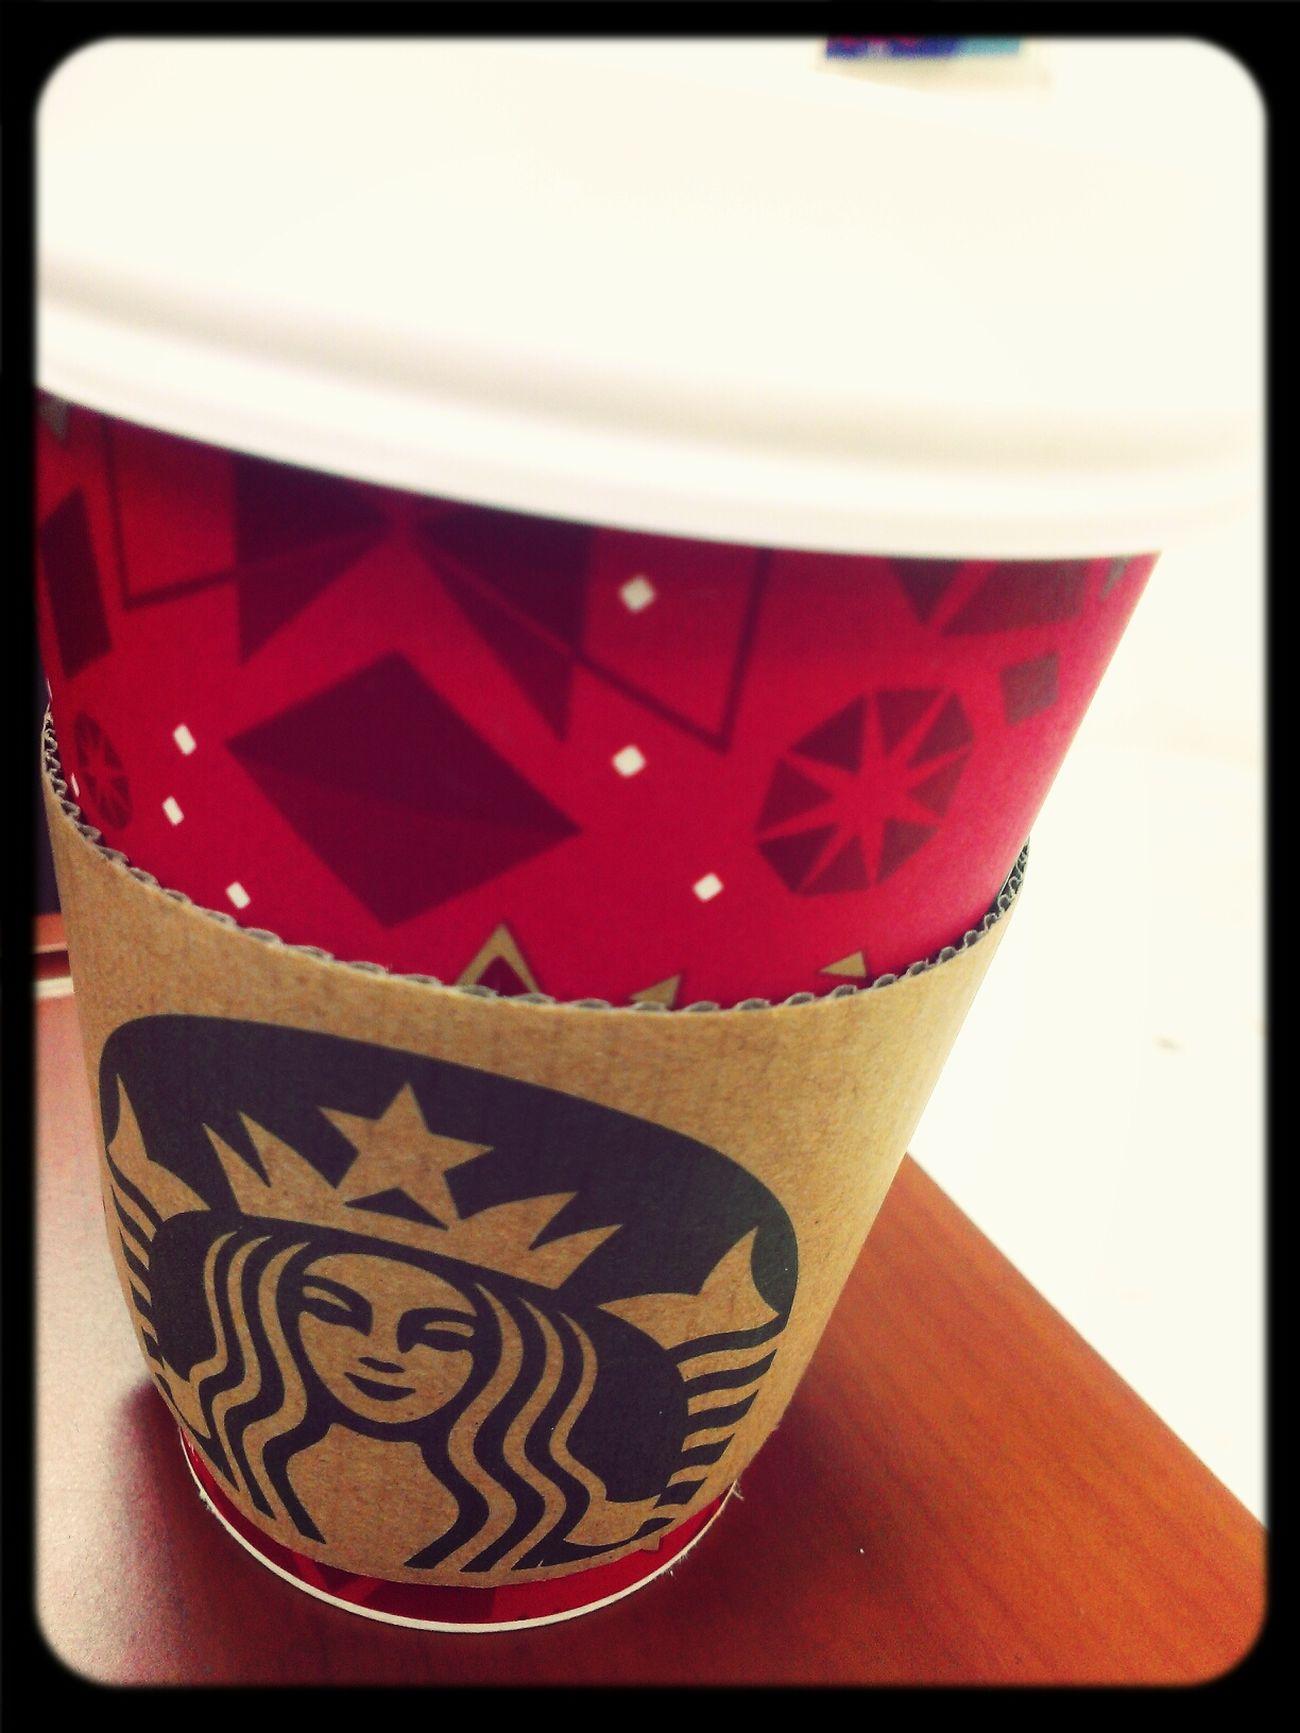 Starbucks Coffee Latte冷冷的就是要喝熱那堤。